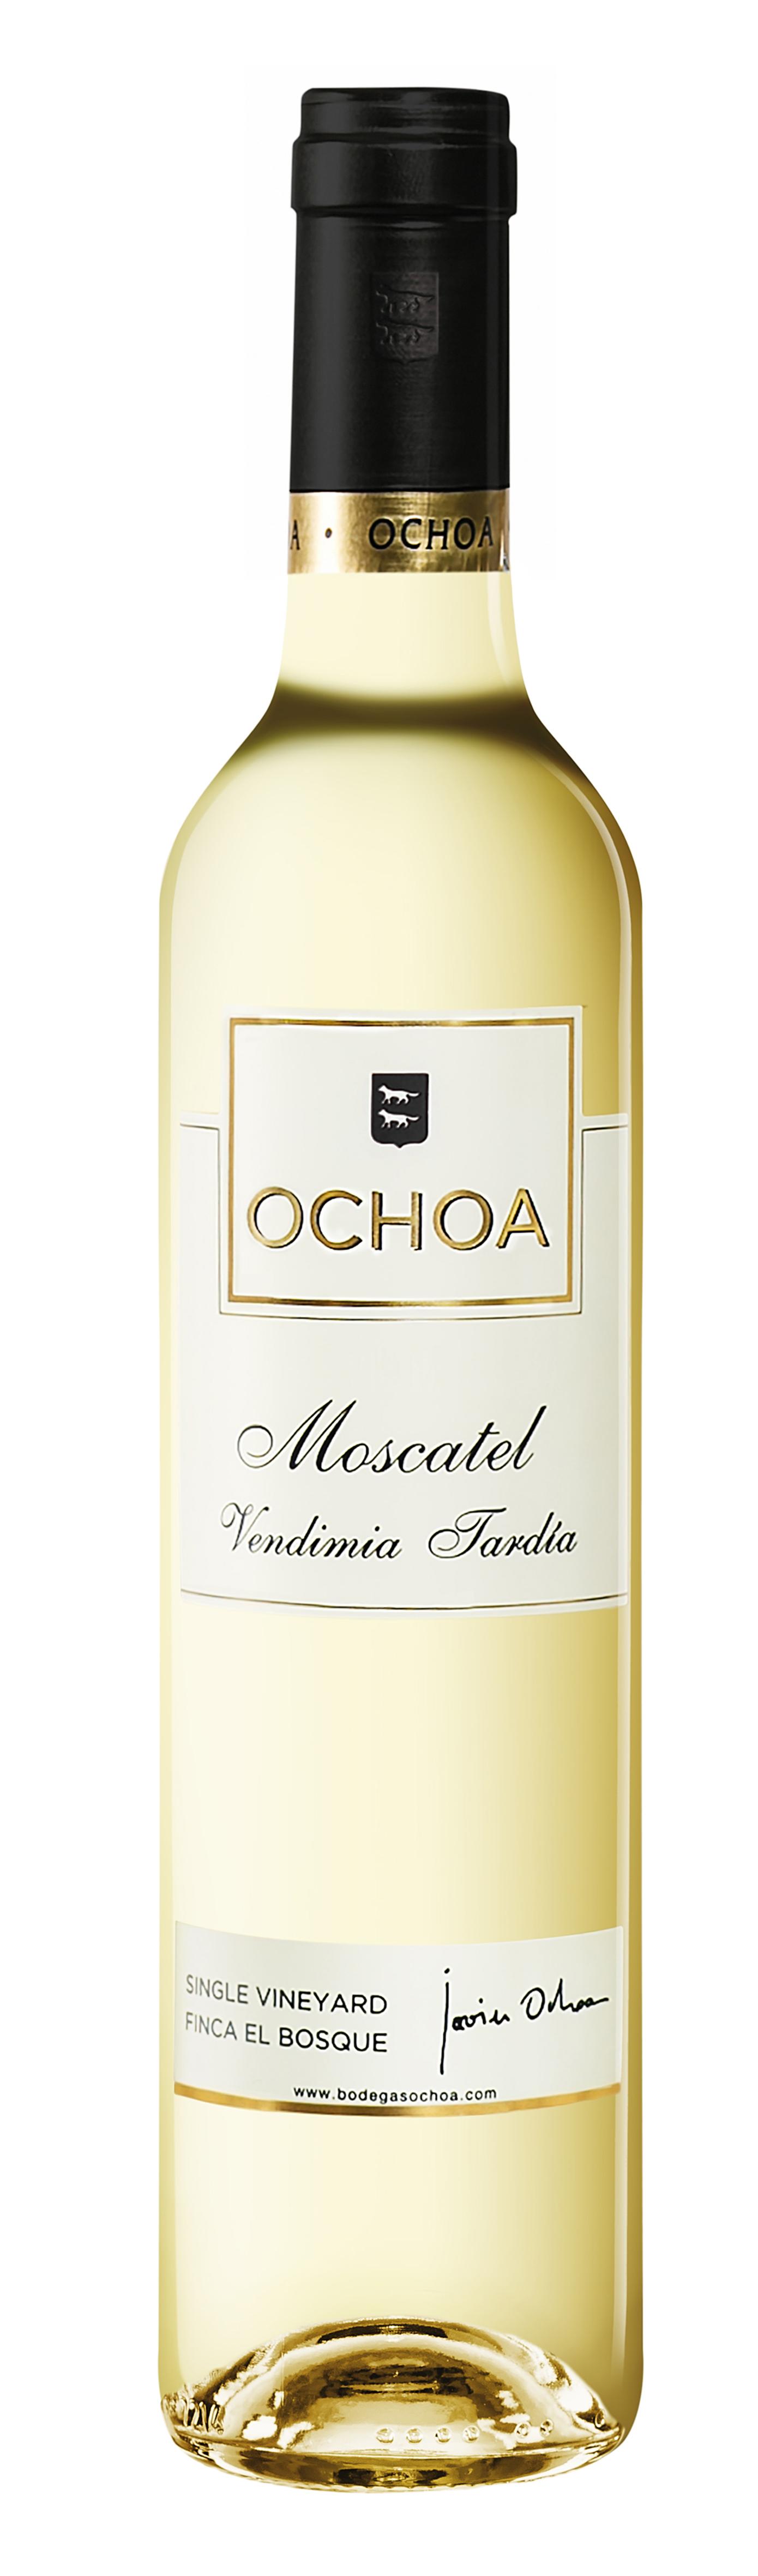 Ochoa Moscatel Vendimia Tardía